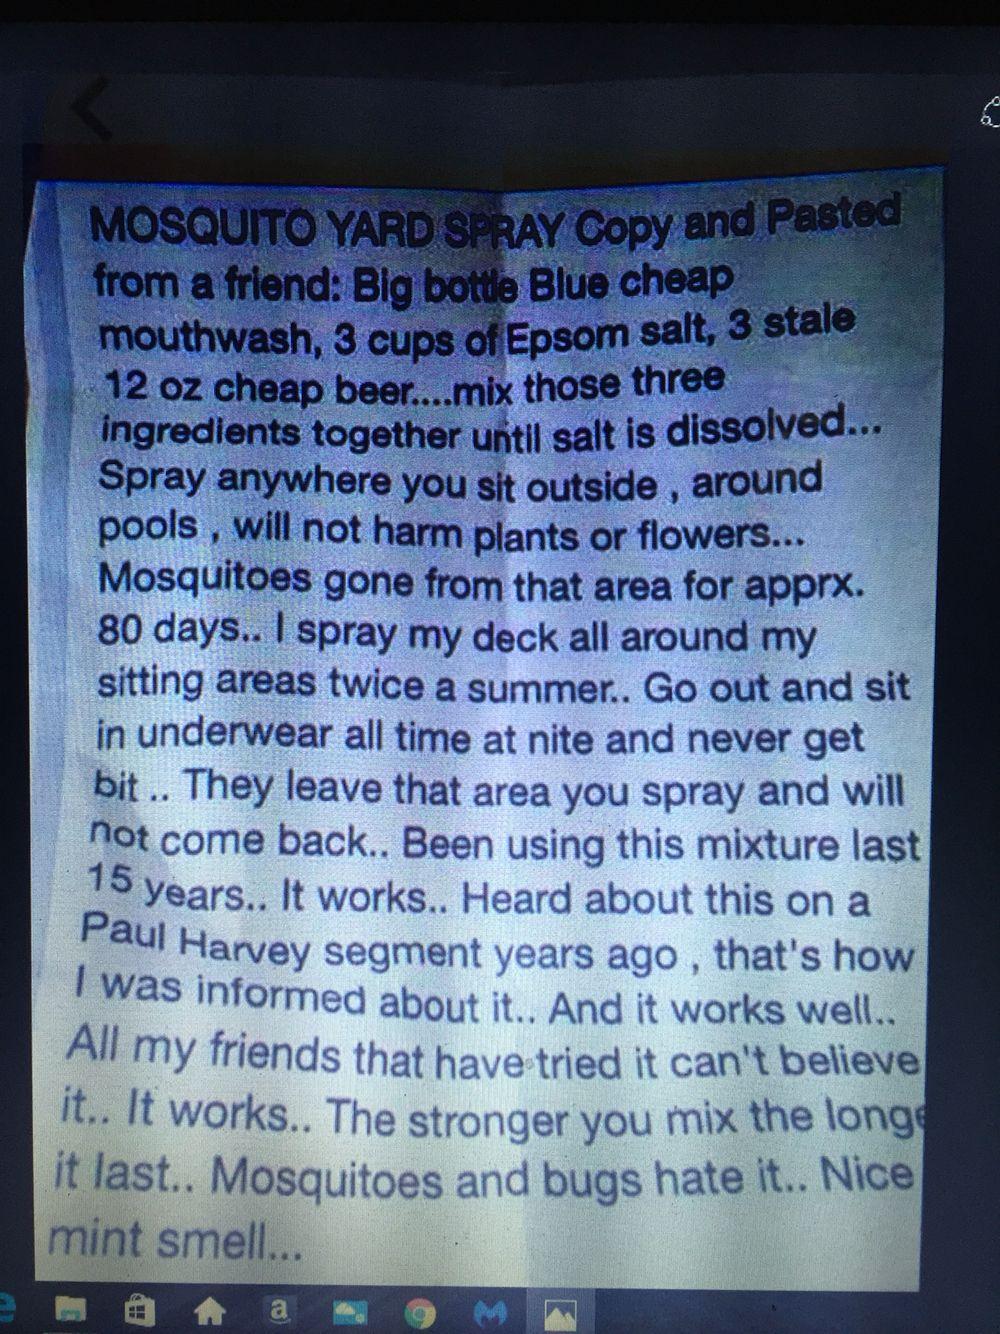 DIY mosquito repellent yard spray Diy mosquito repellent